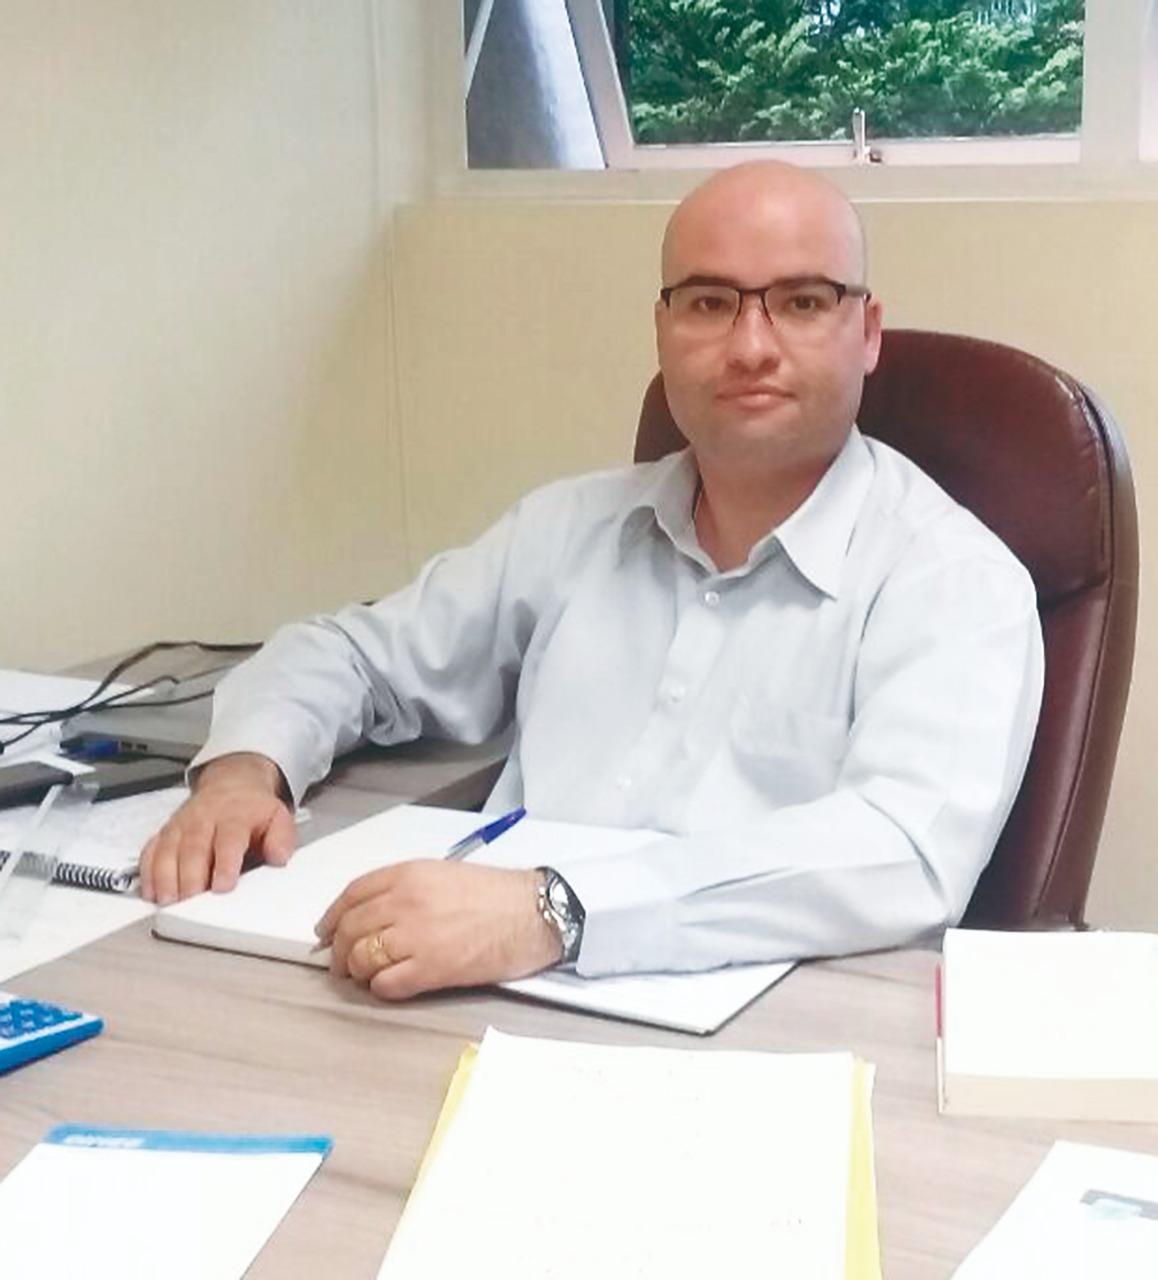 Dr. Ricardo Emiliano Rodrigues Sanches